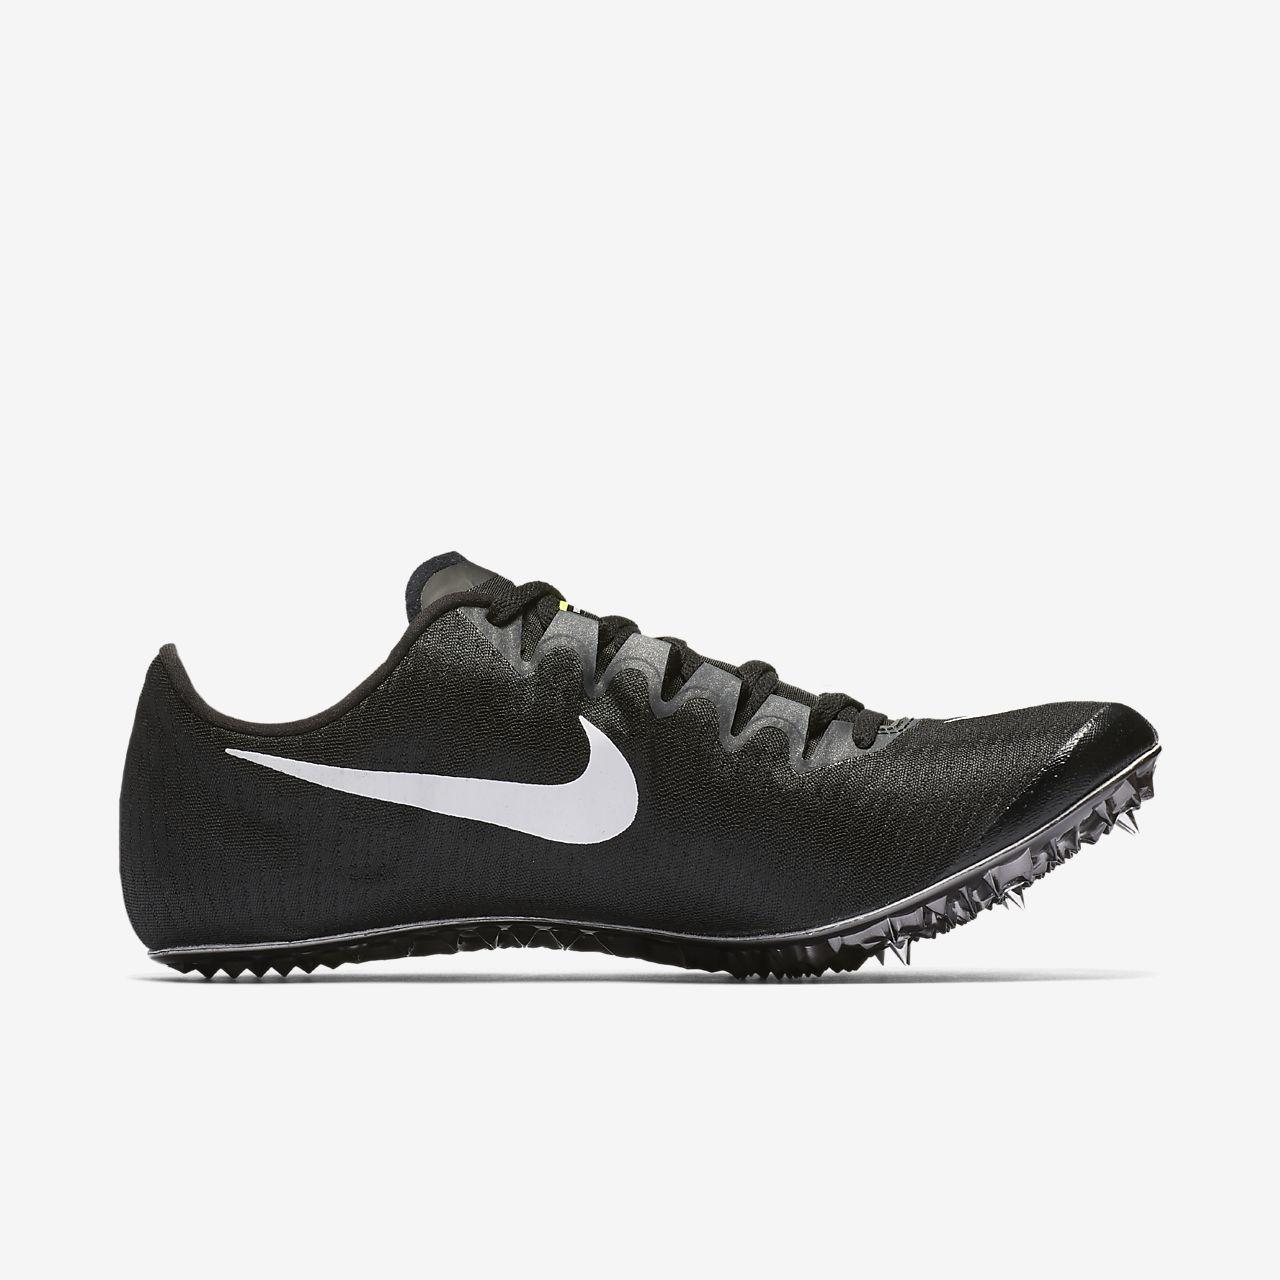 Nike Track And Field Shoes 2017 - Style Guru: Fashion ...